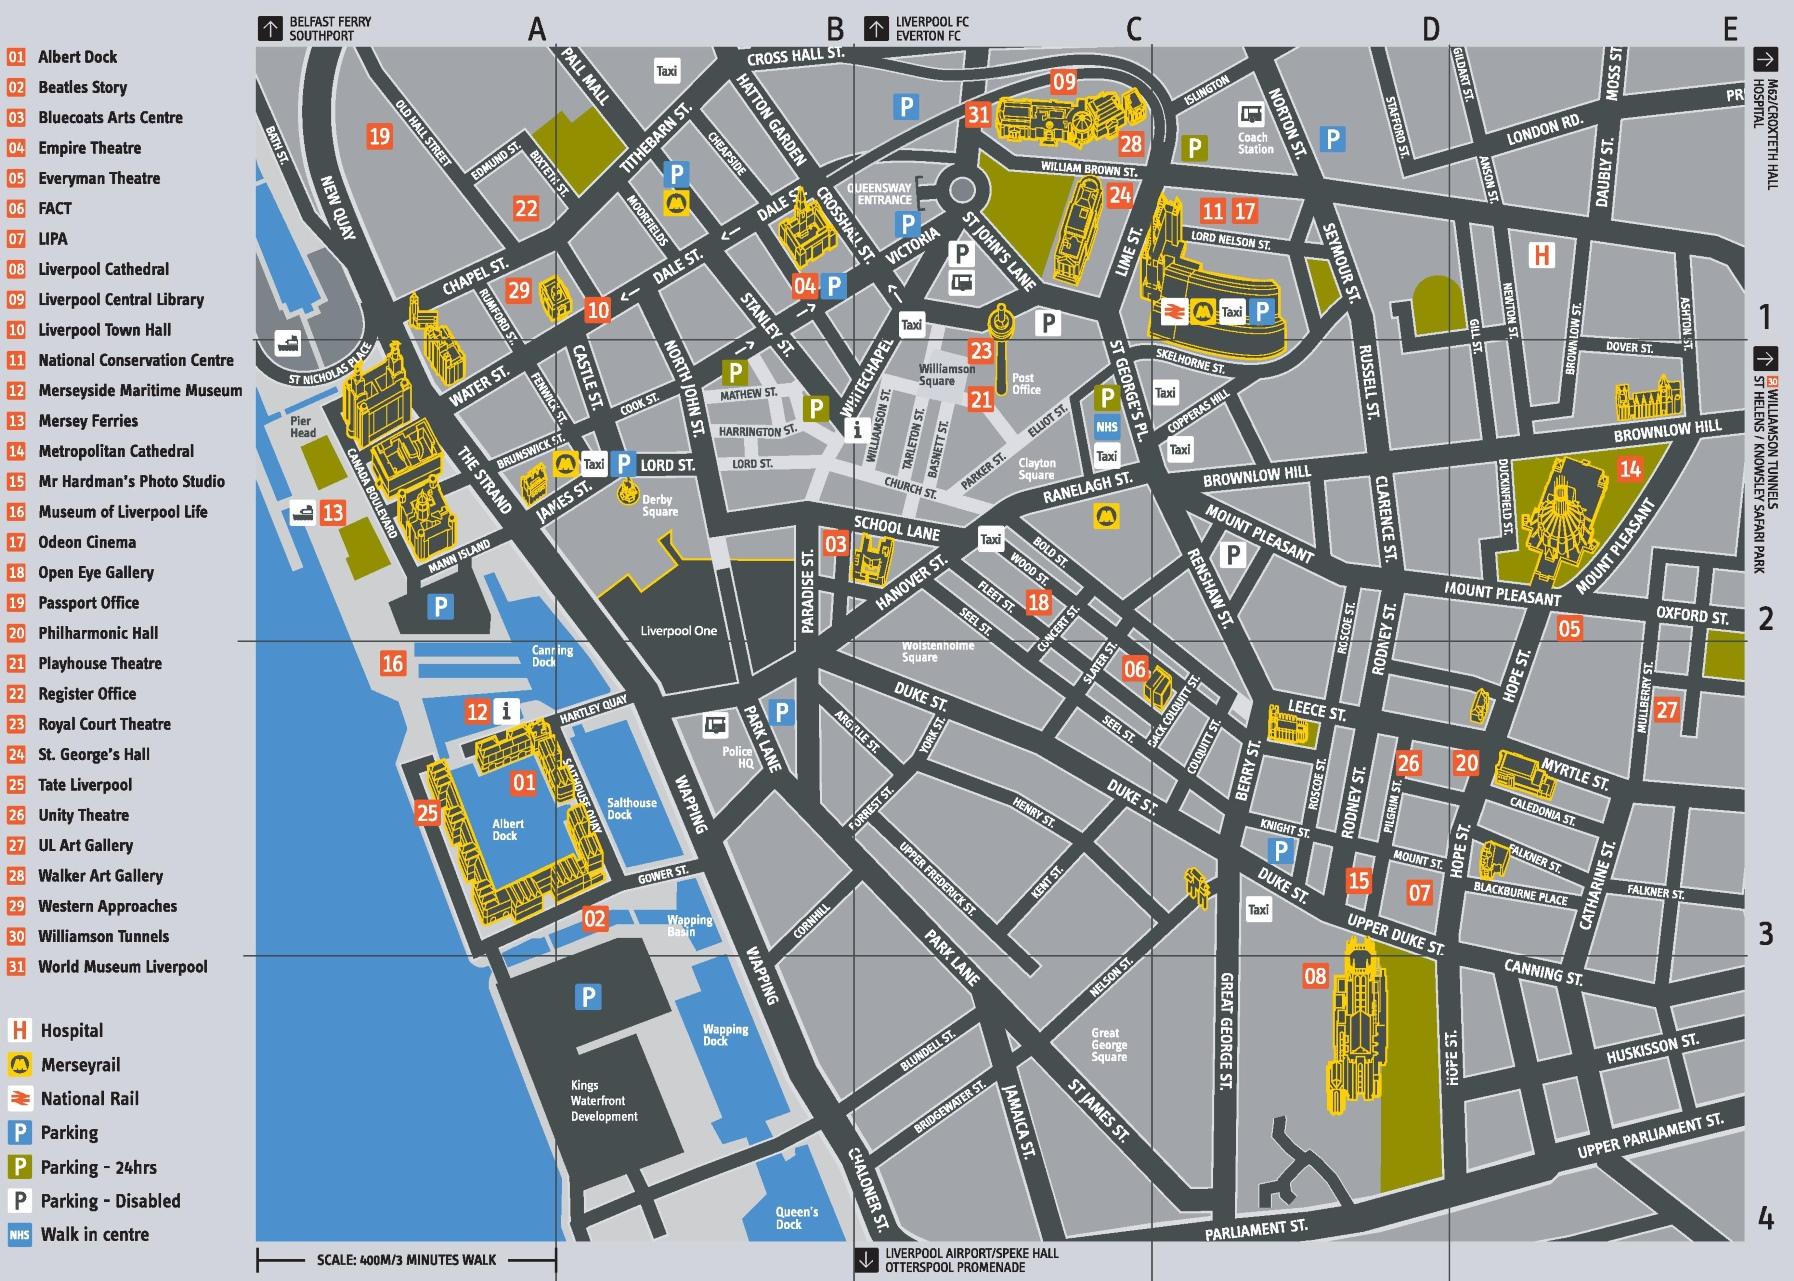 Liverpool Tourist Map Liverpool tourist attractions map Liverpool Tourist Map